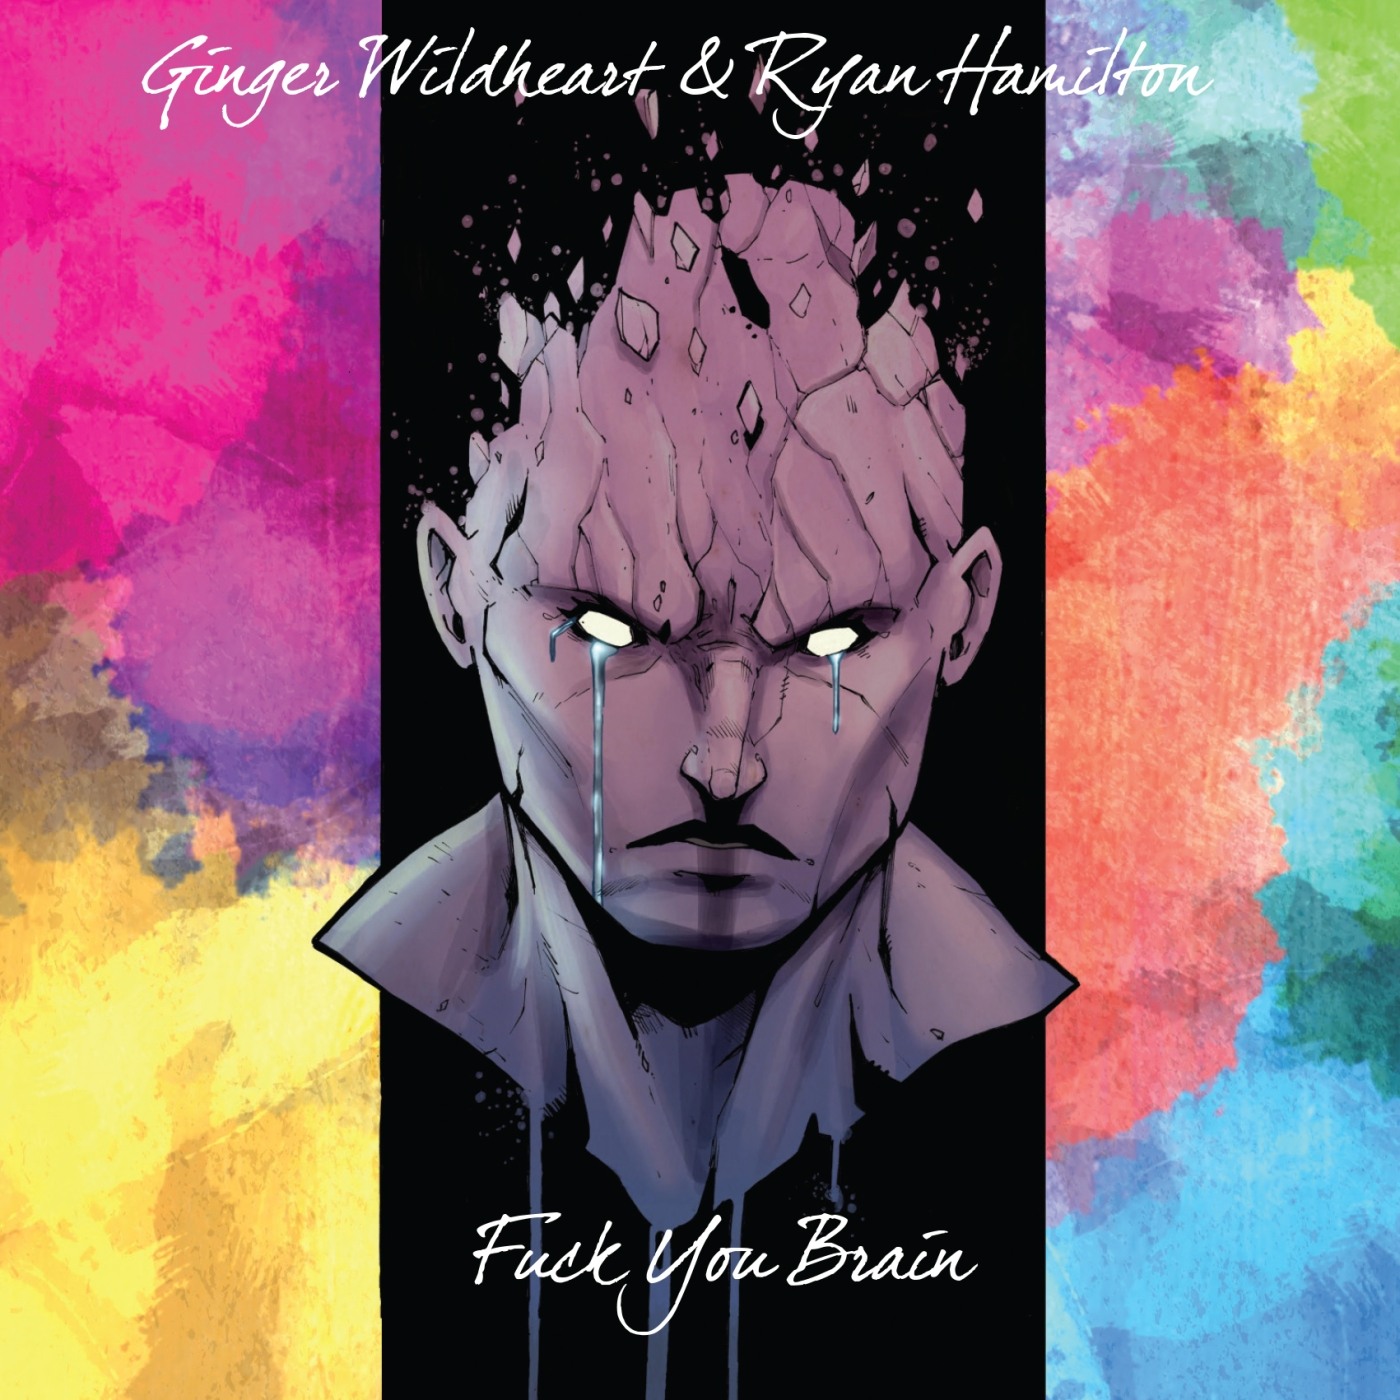 Ginger Wildheart and Ryan Hamilton - Fuck You Brain cover